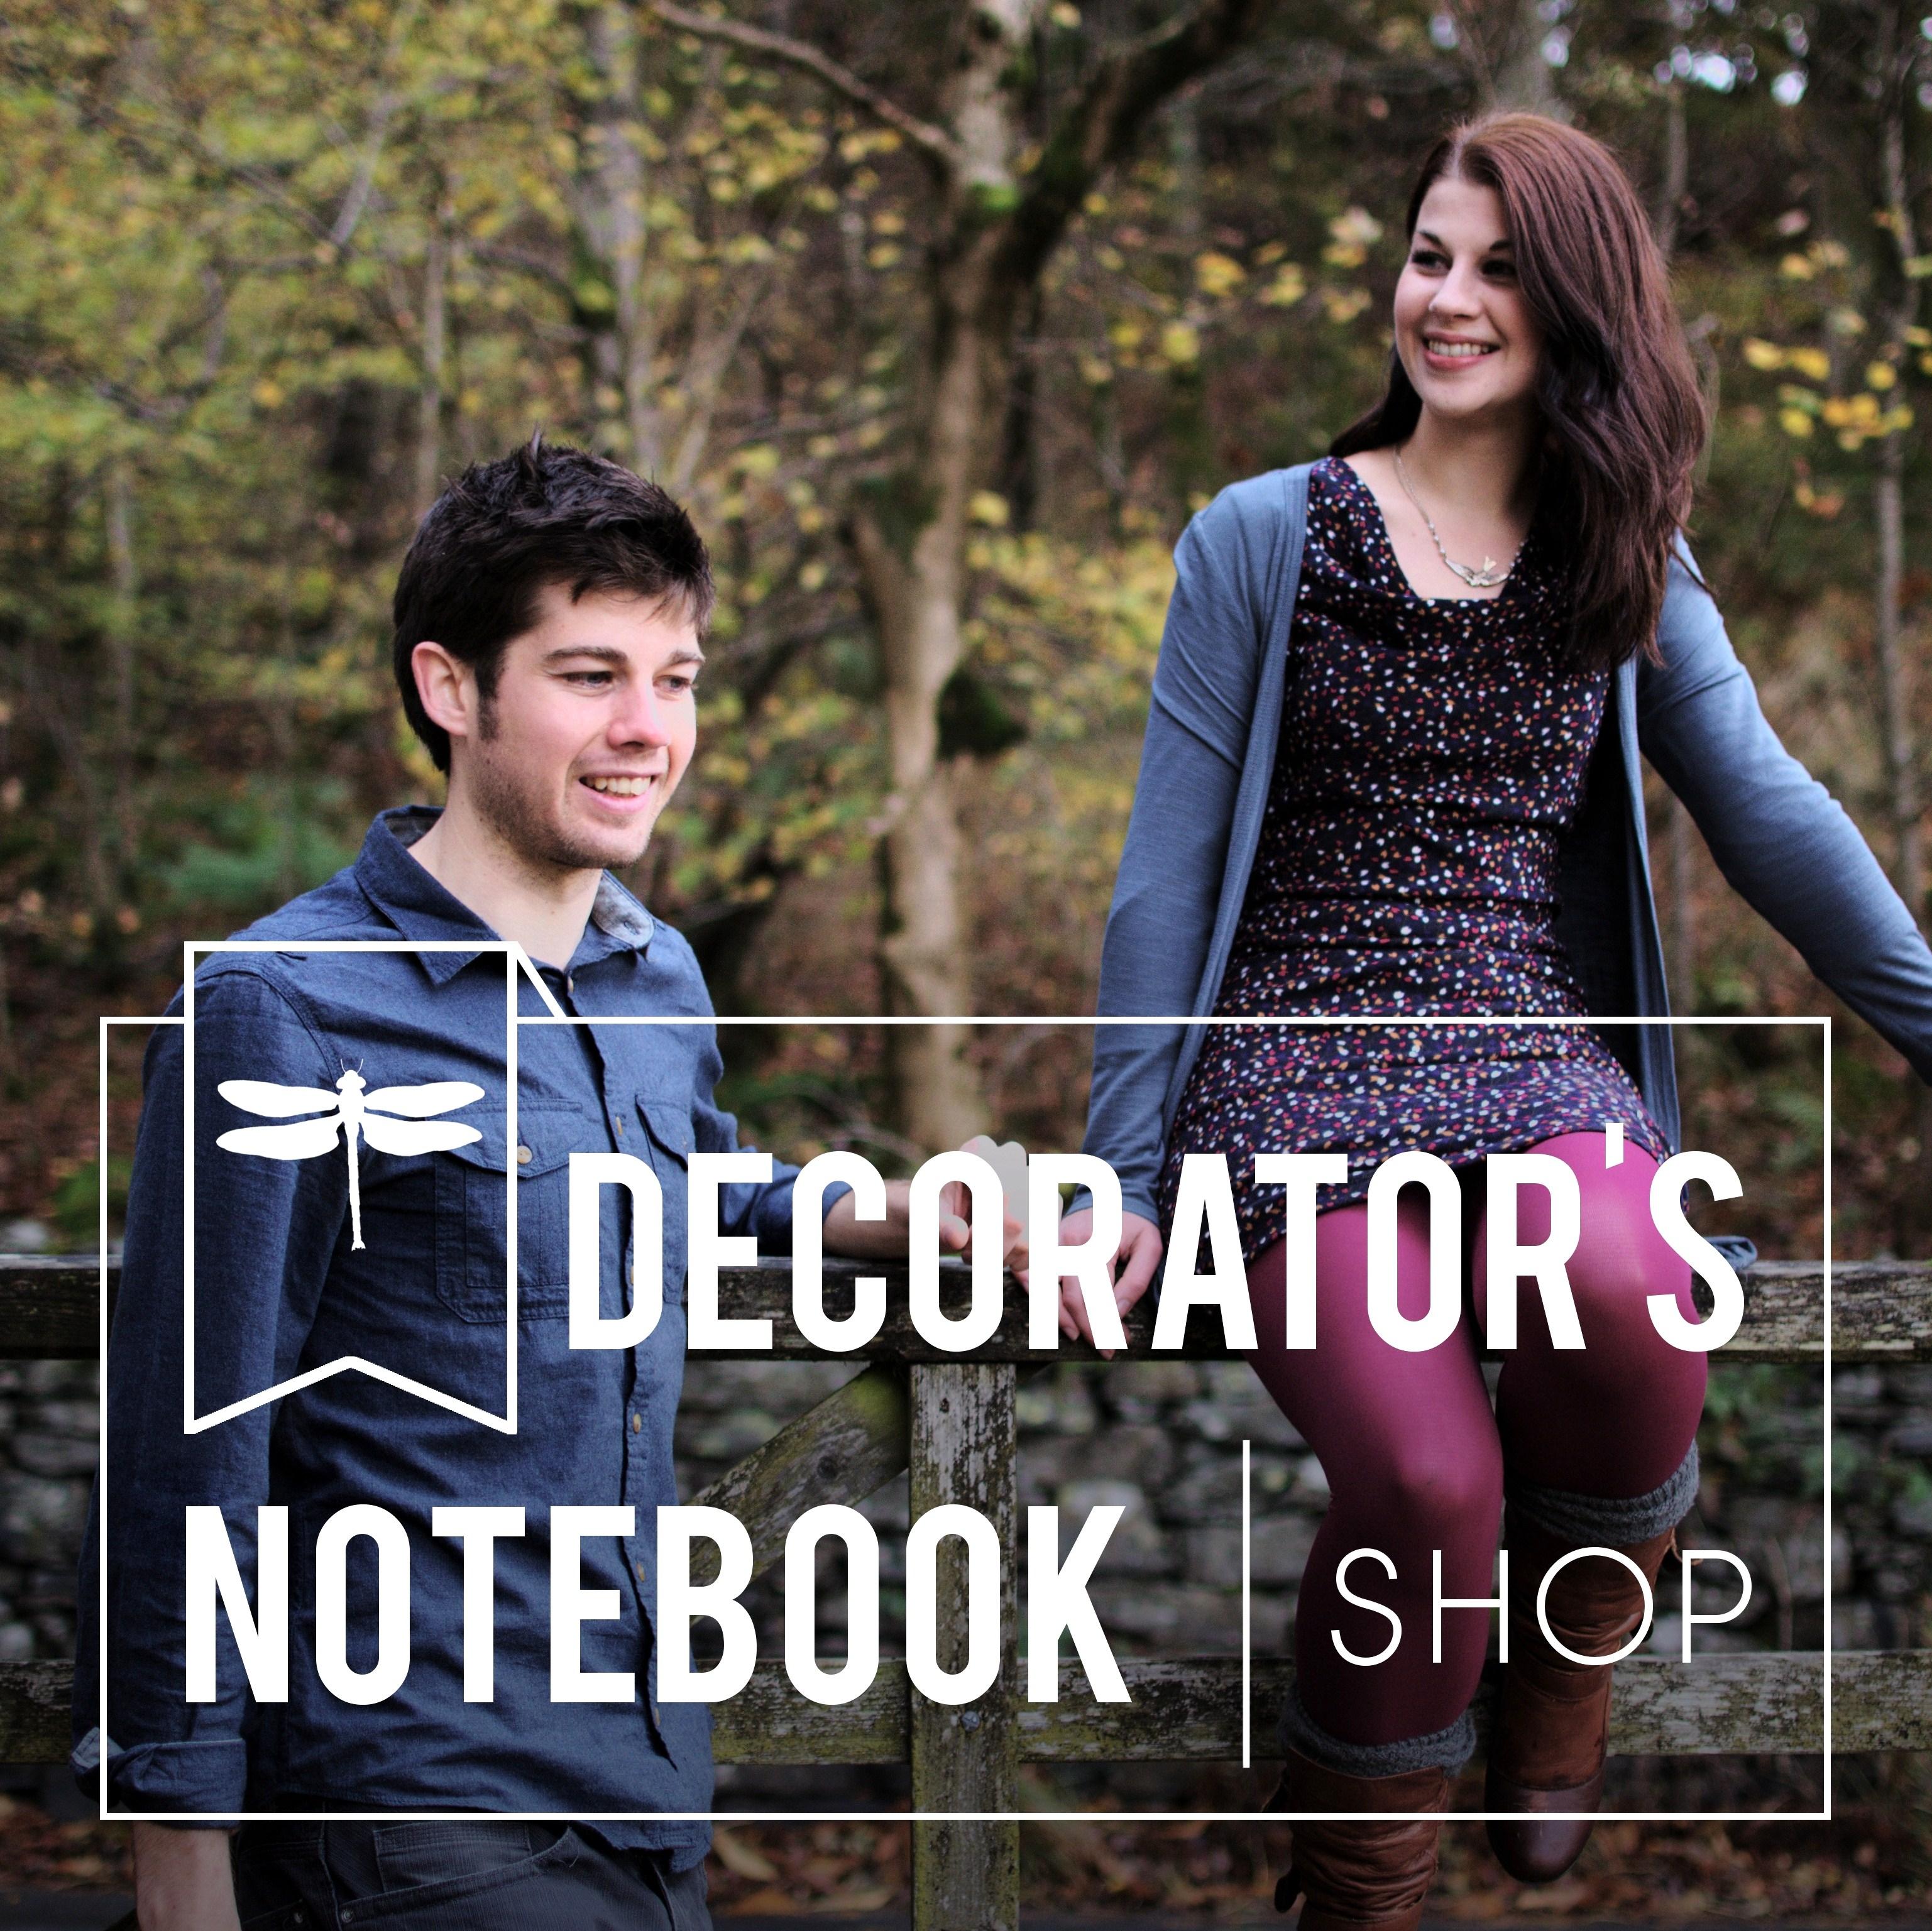 Decorator's Notebook Shop announcement